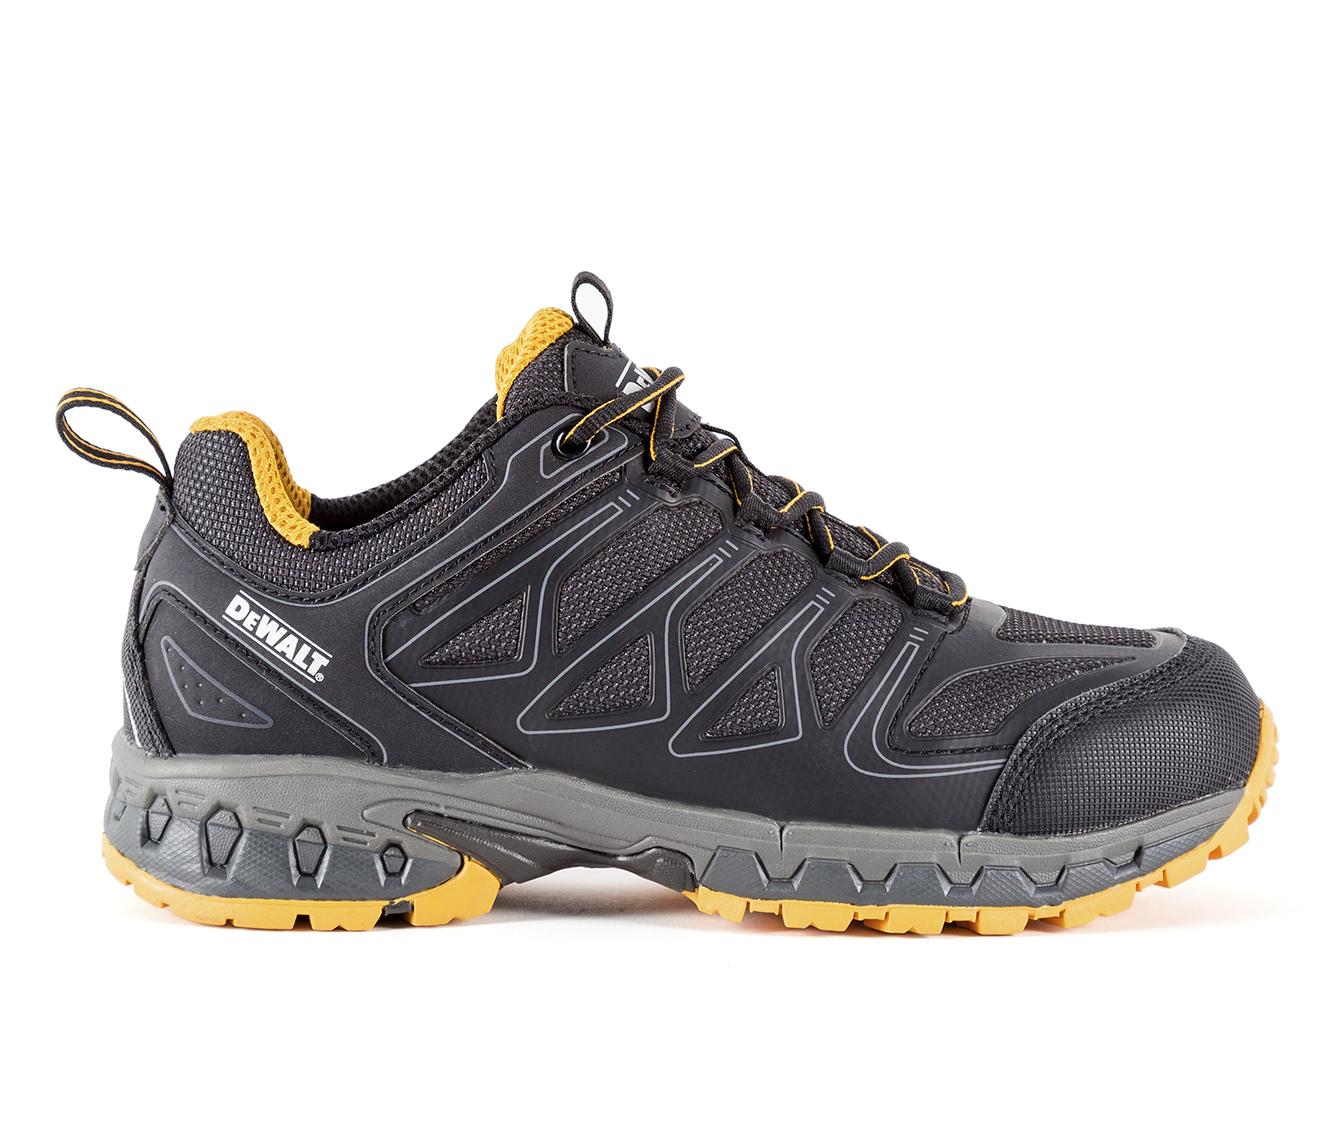 DeWALT Boron Slip Resistant Aluminum Toe Men's Boots (Black)